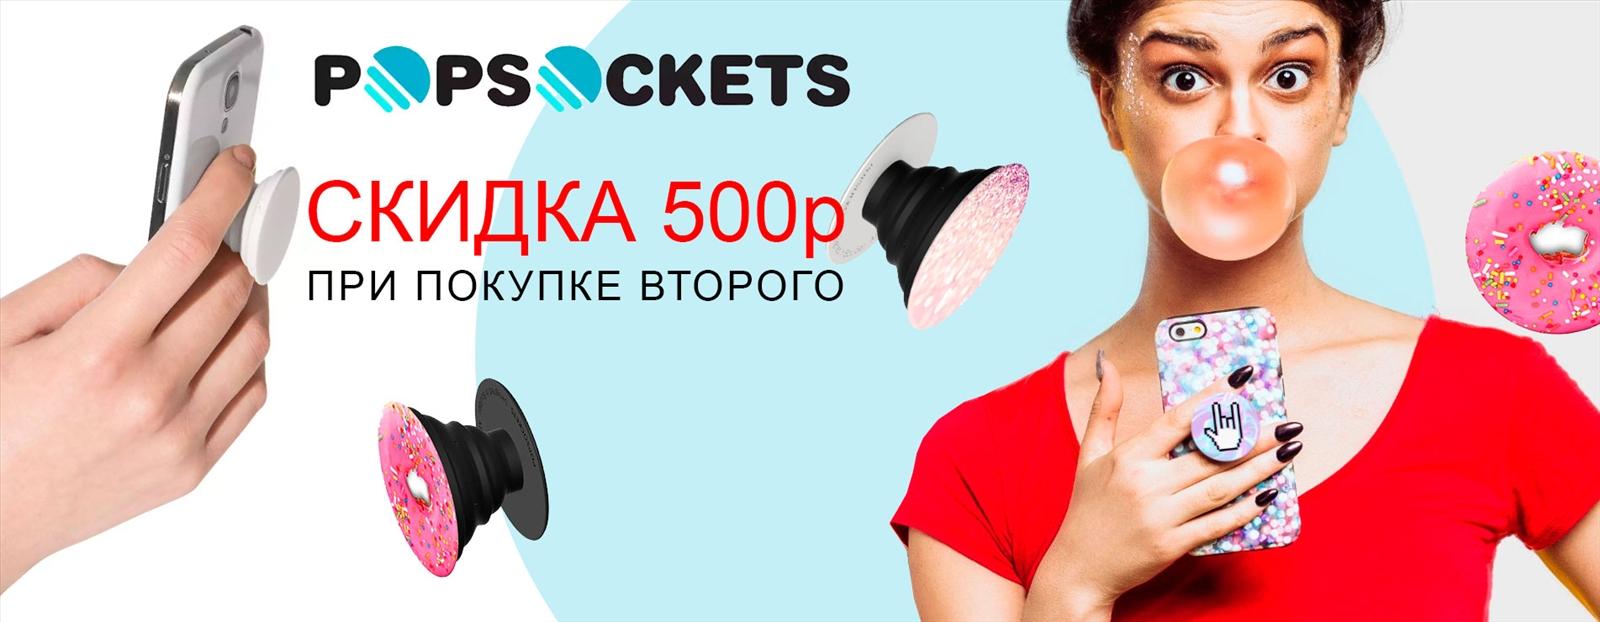 Второй POPSOCKETS за 150 руб.